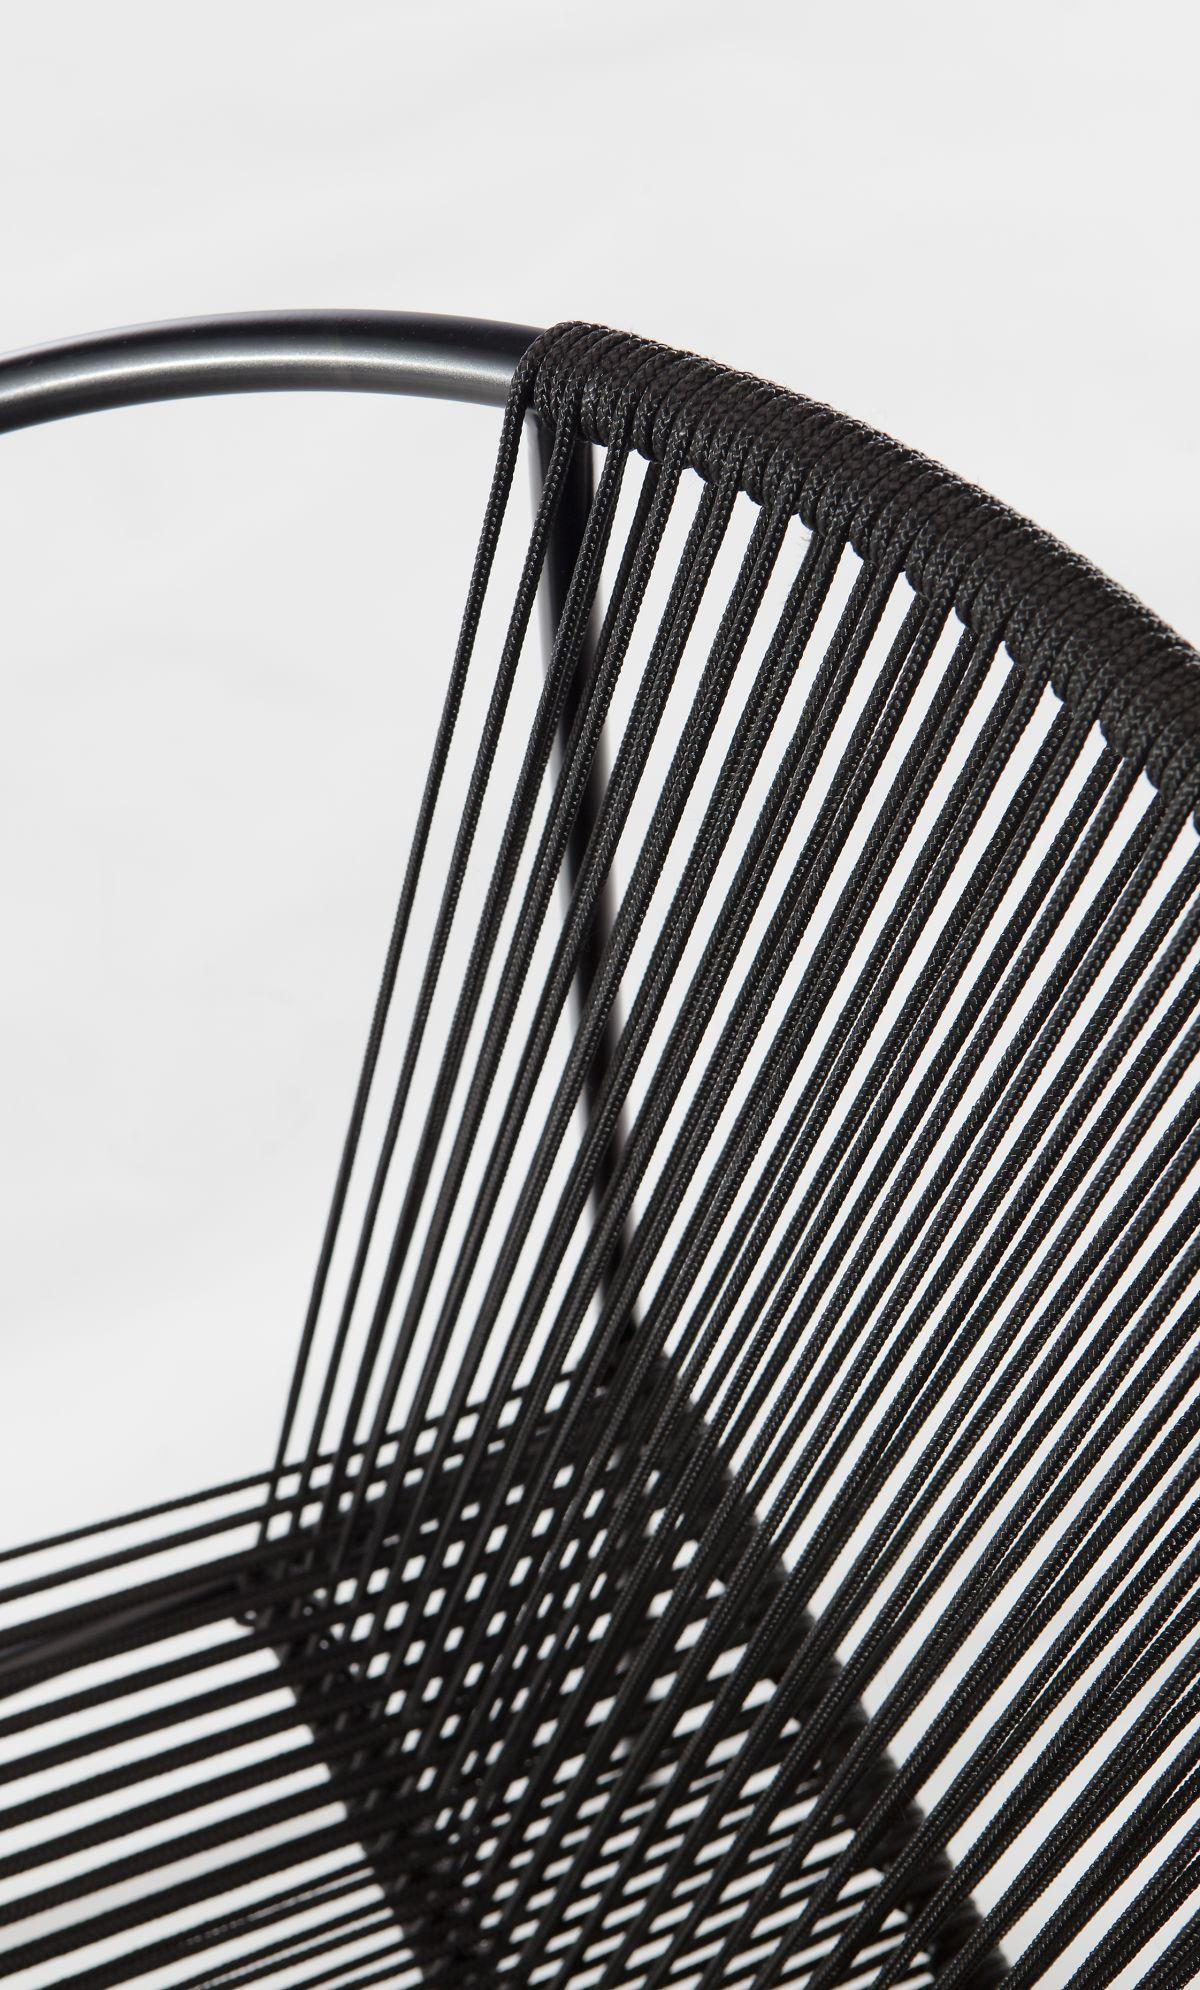 Trolle-Rudebeck-Haar_-String-Chair_Detail-Photo-Chikako-Harada_72Dpi